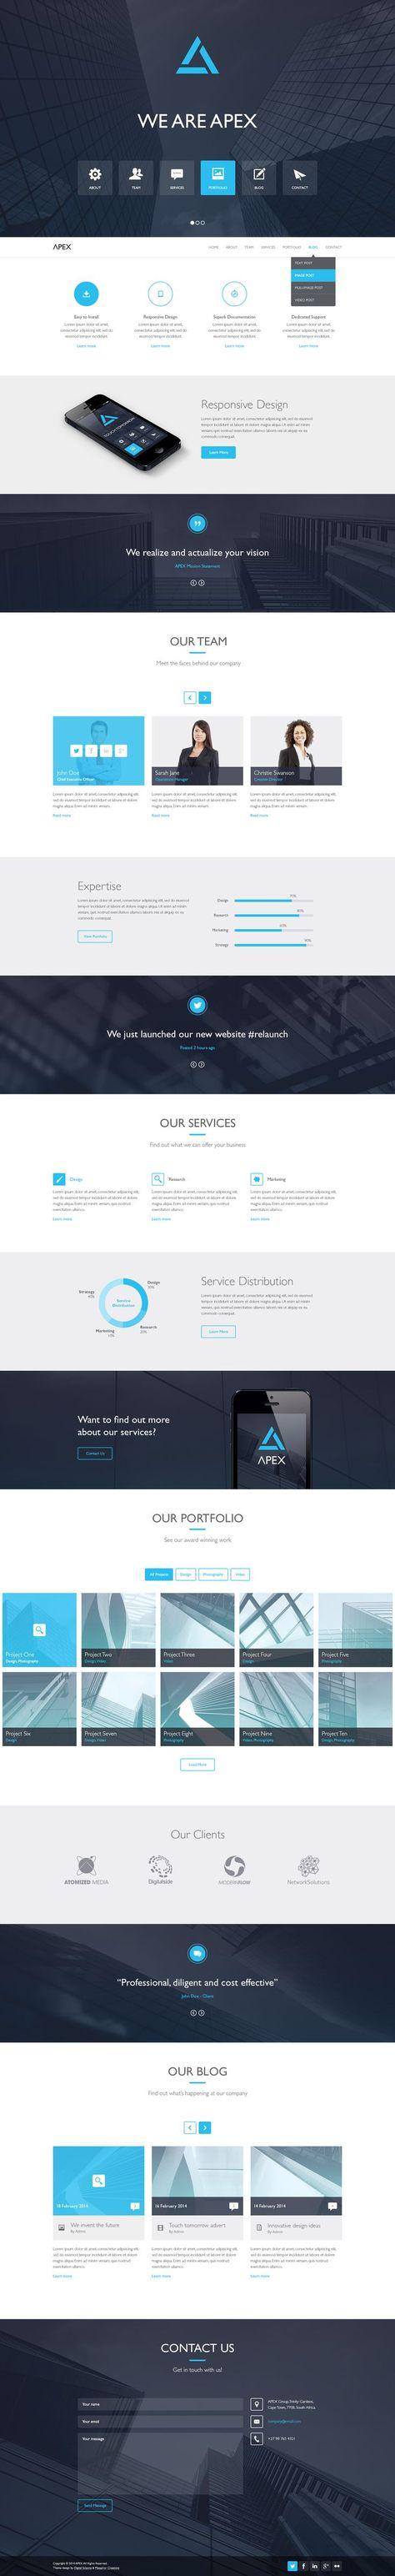 Apex - Responsive WordPress Theme by meta4creations